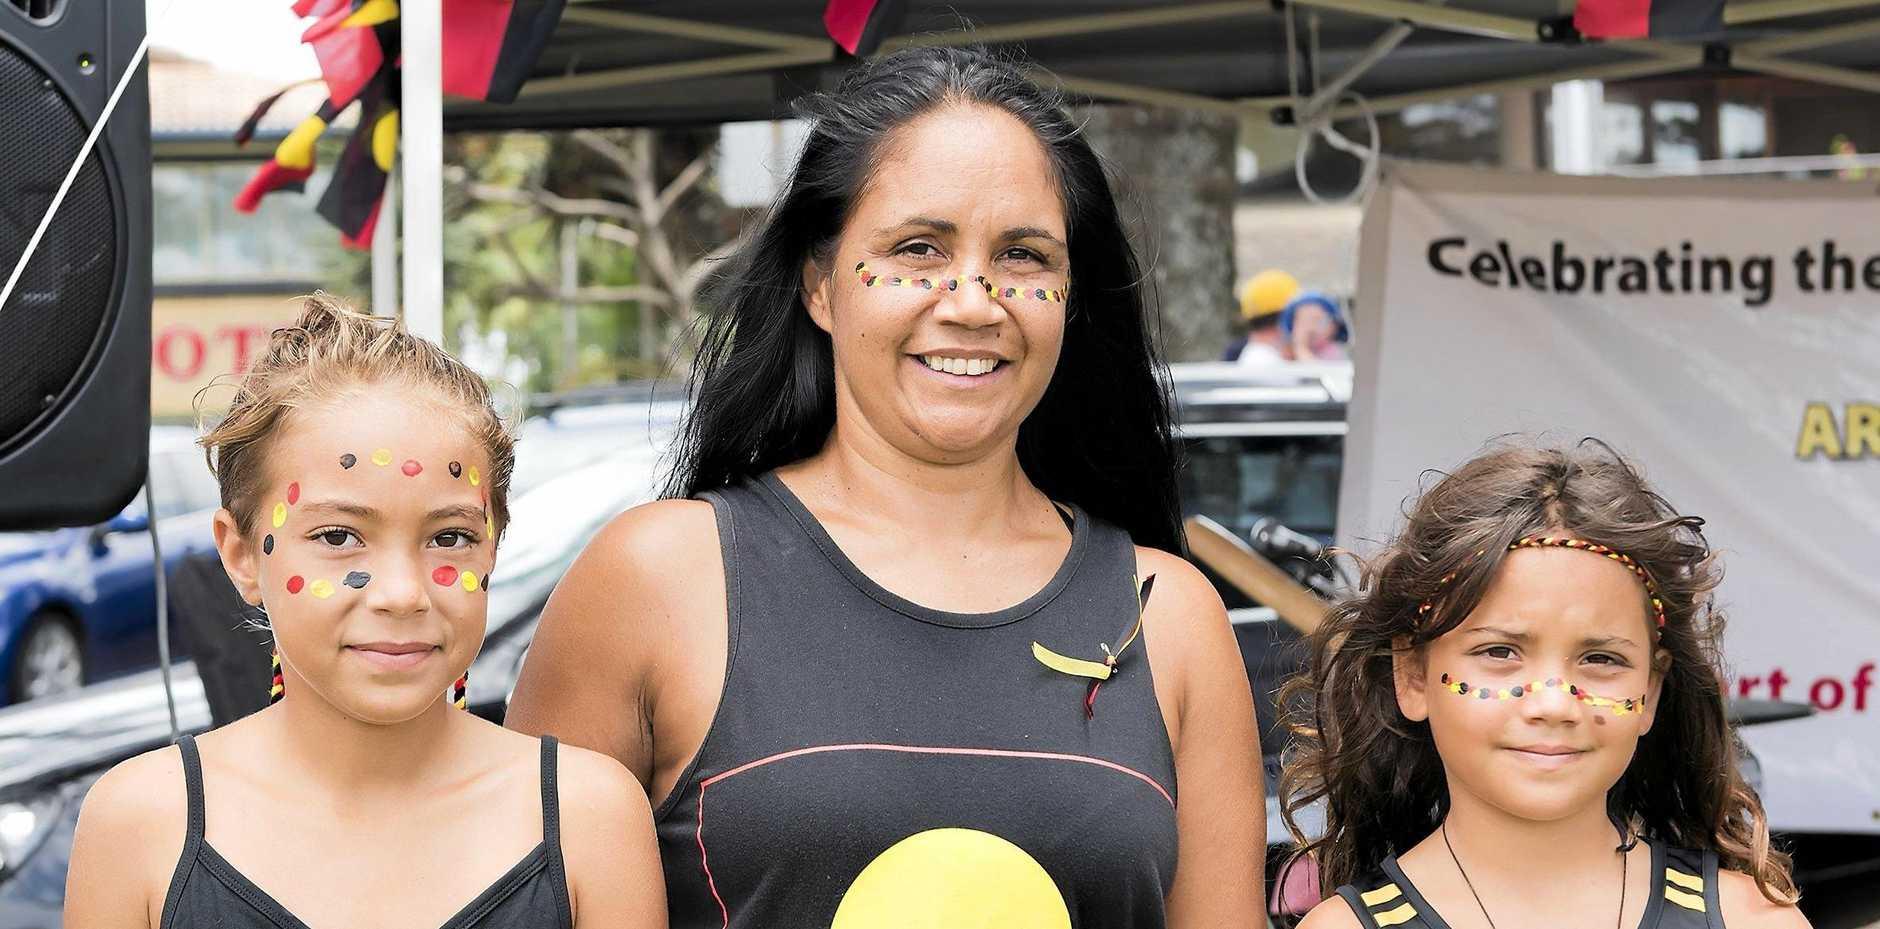 AUSTRALIA'S BIG DAY: YiYi, Delta Kaye and Indira at the Byron Bay Survival Day Celebrations in 2017.